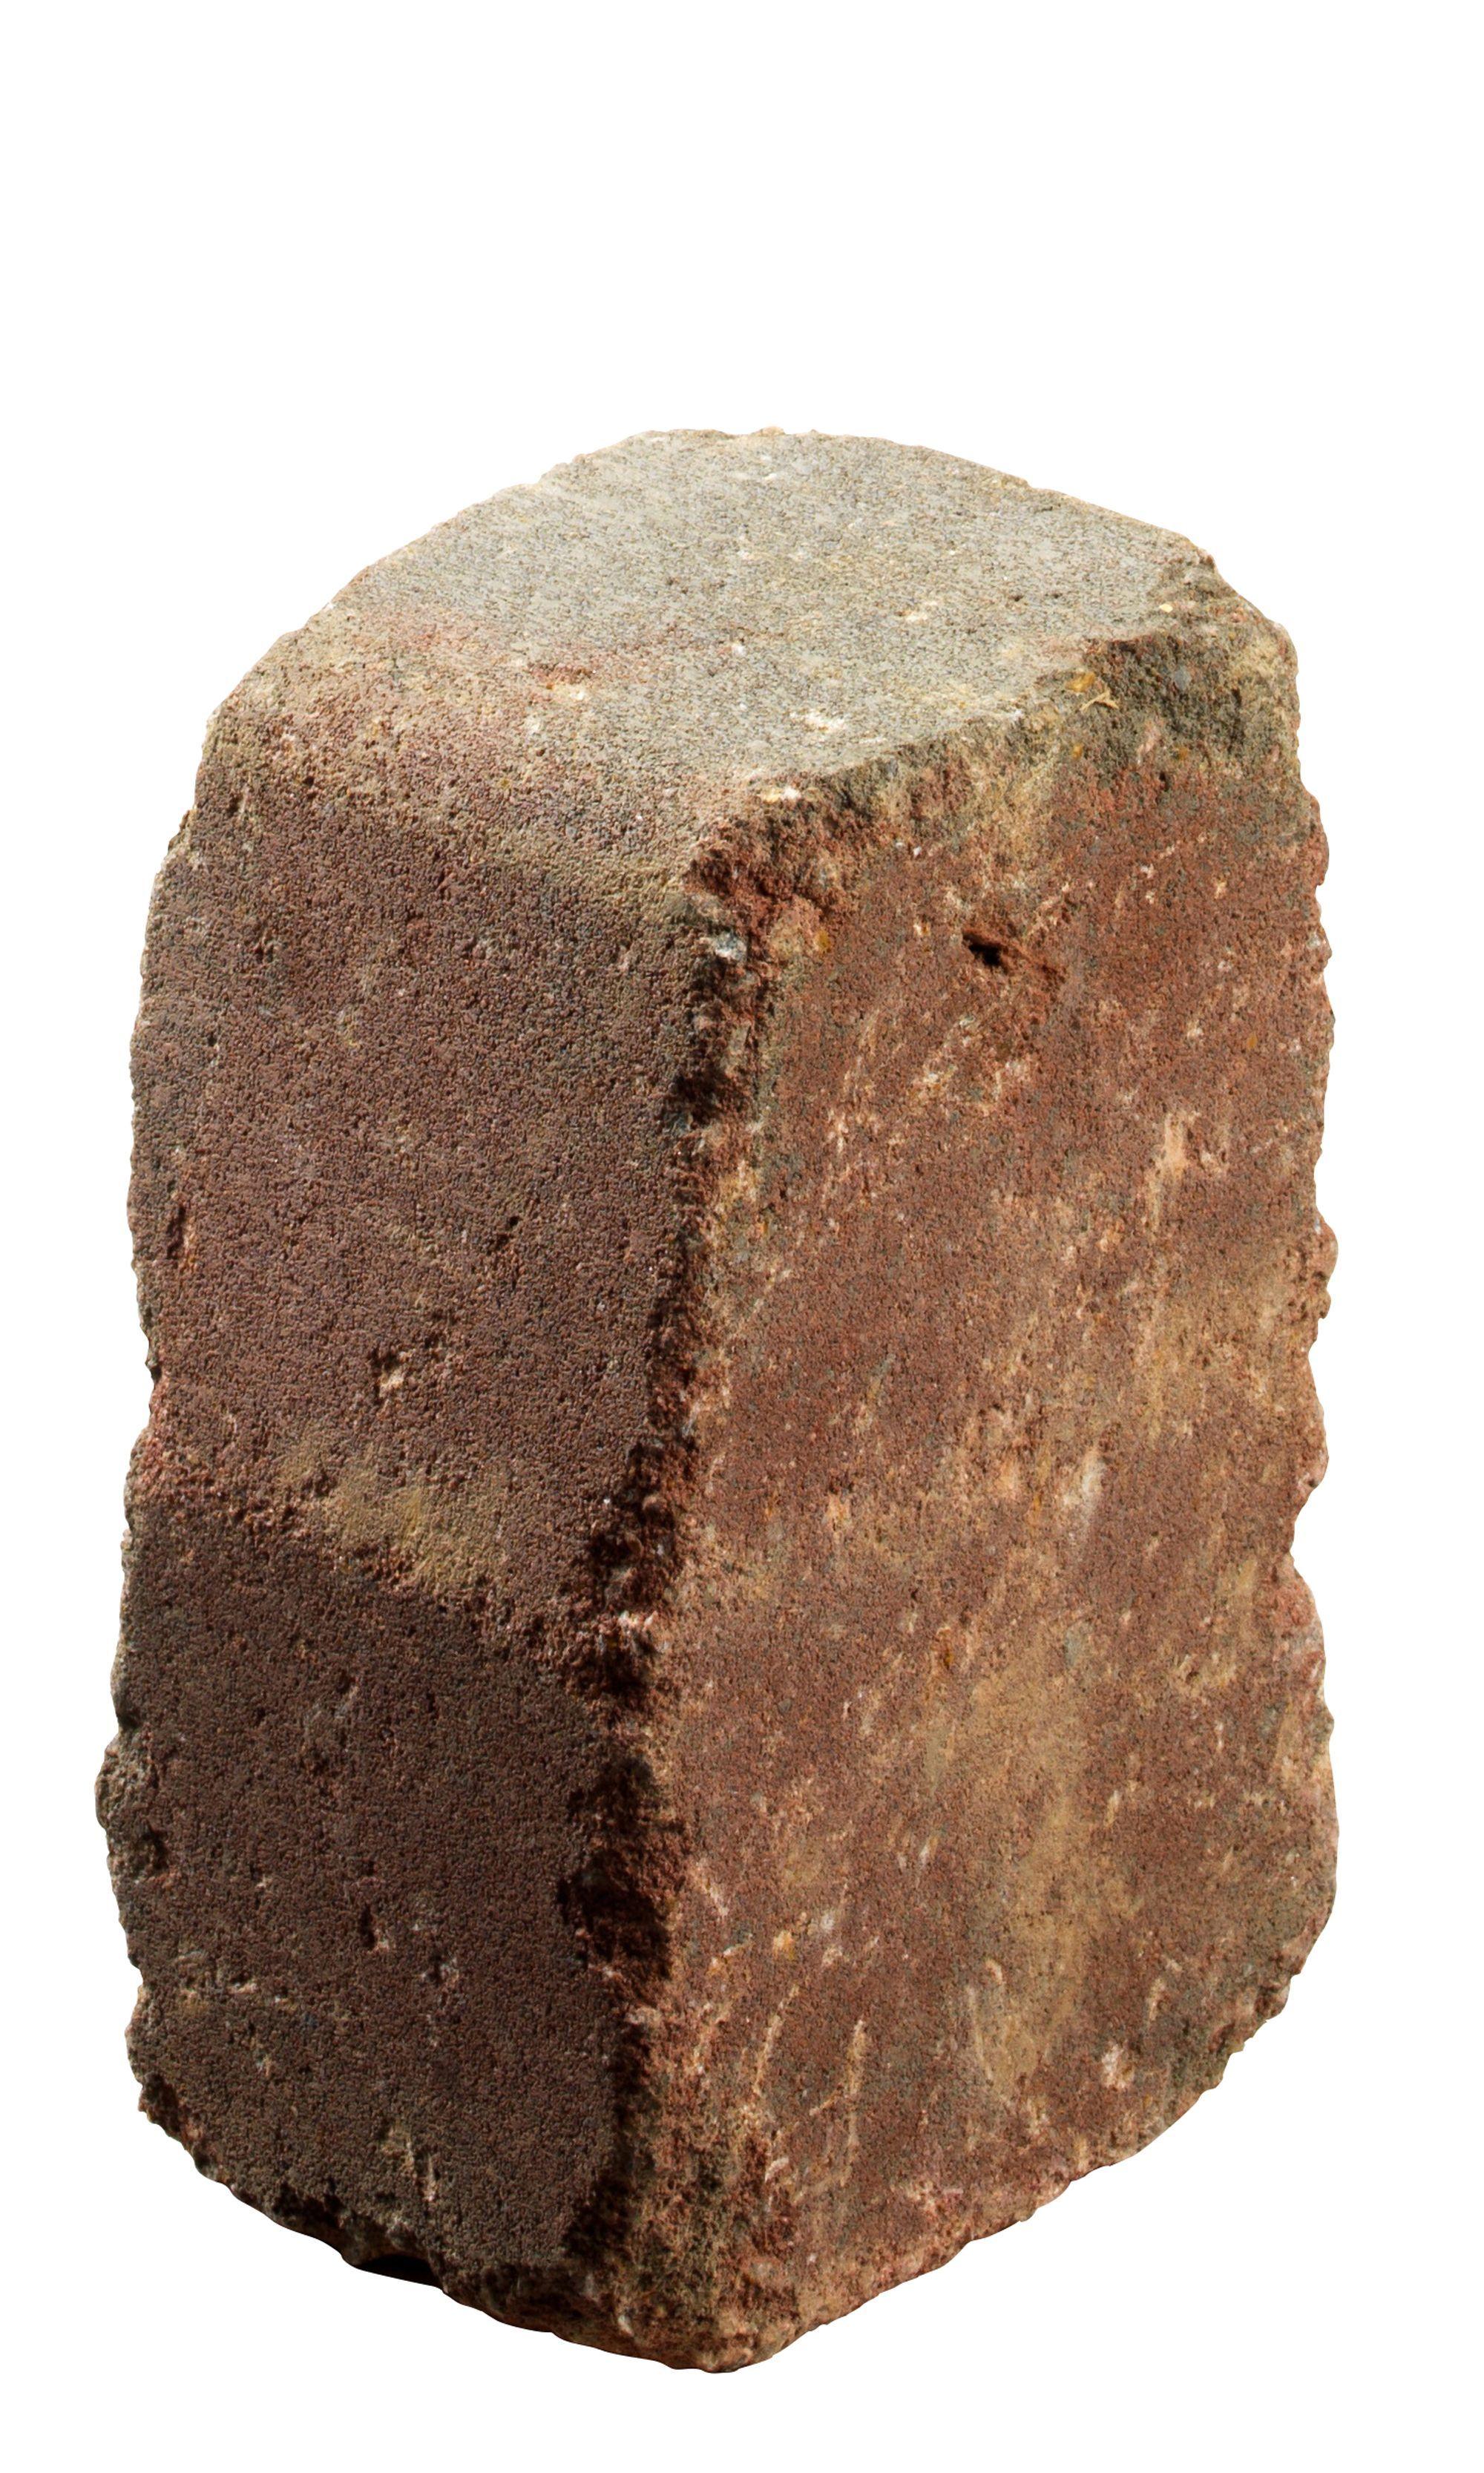 woburn rumbled block kerb autumn l 200mm h 100mm t 100mm pack of